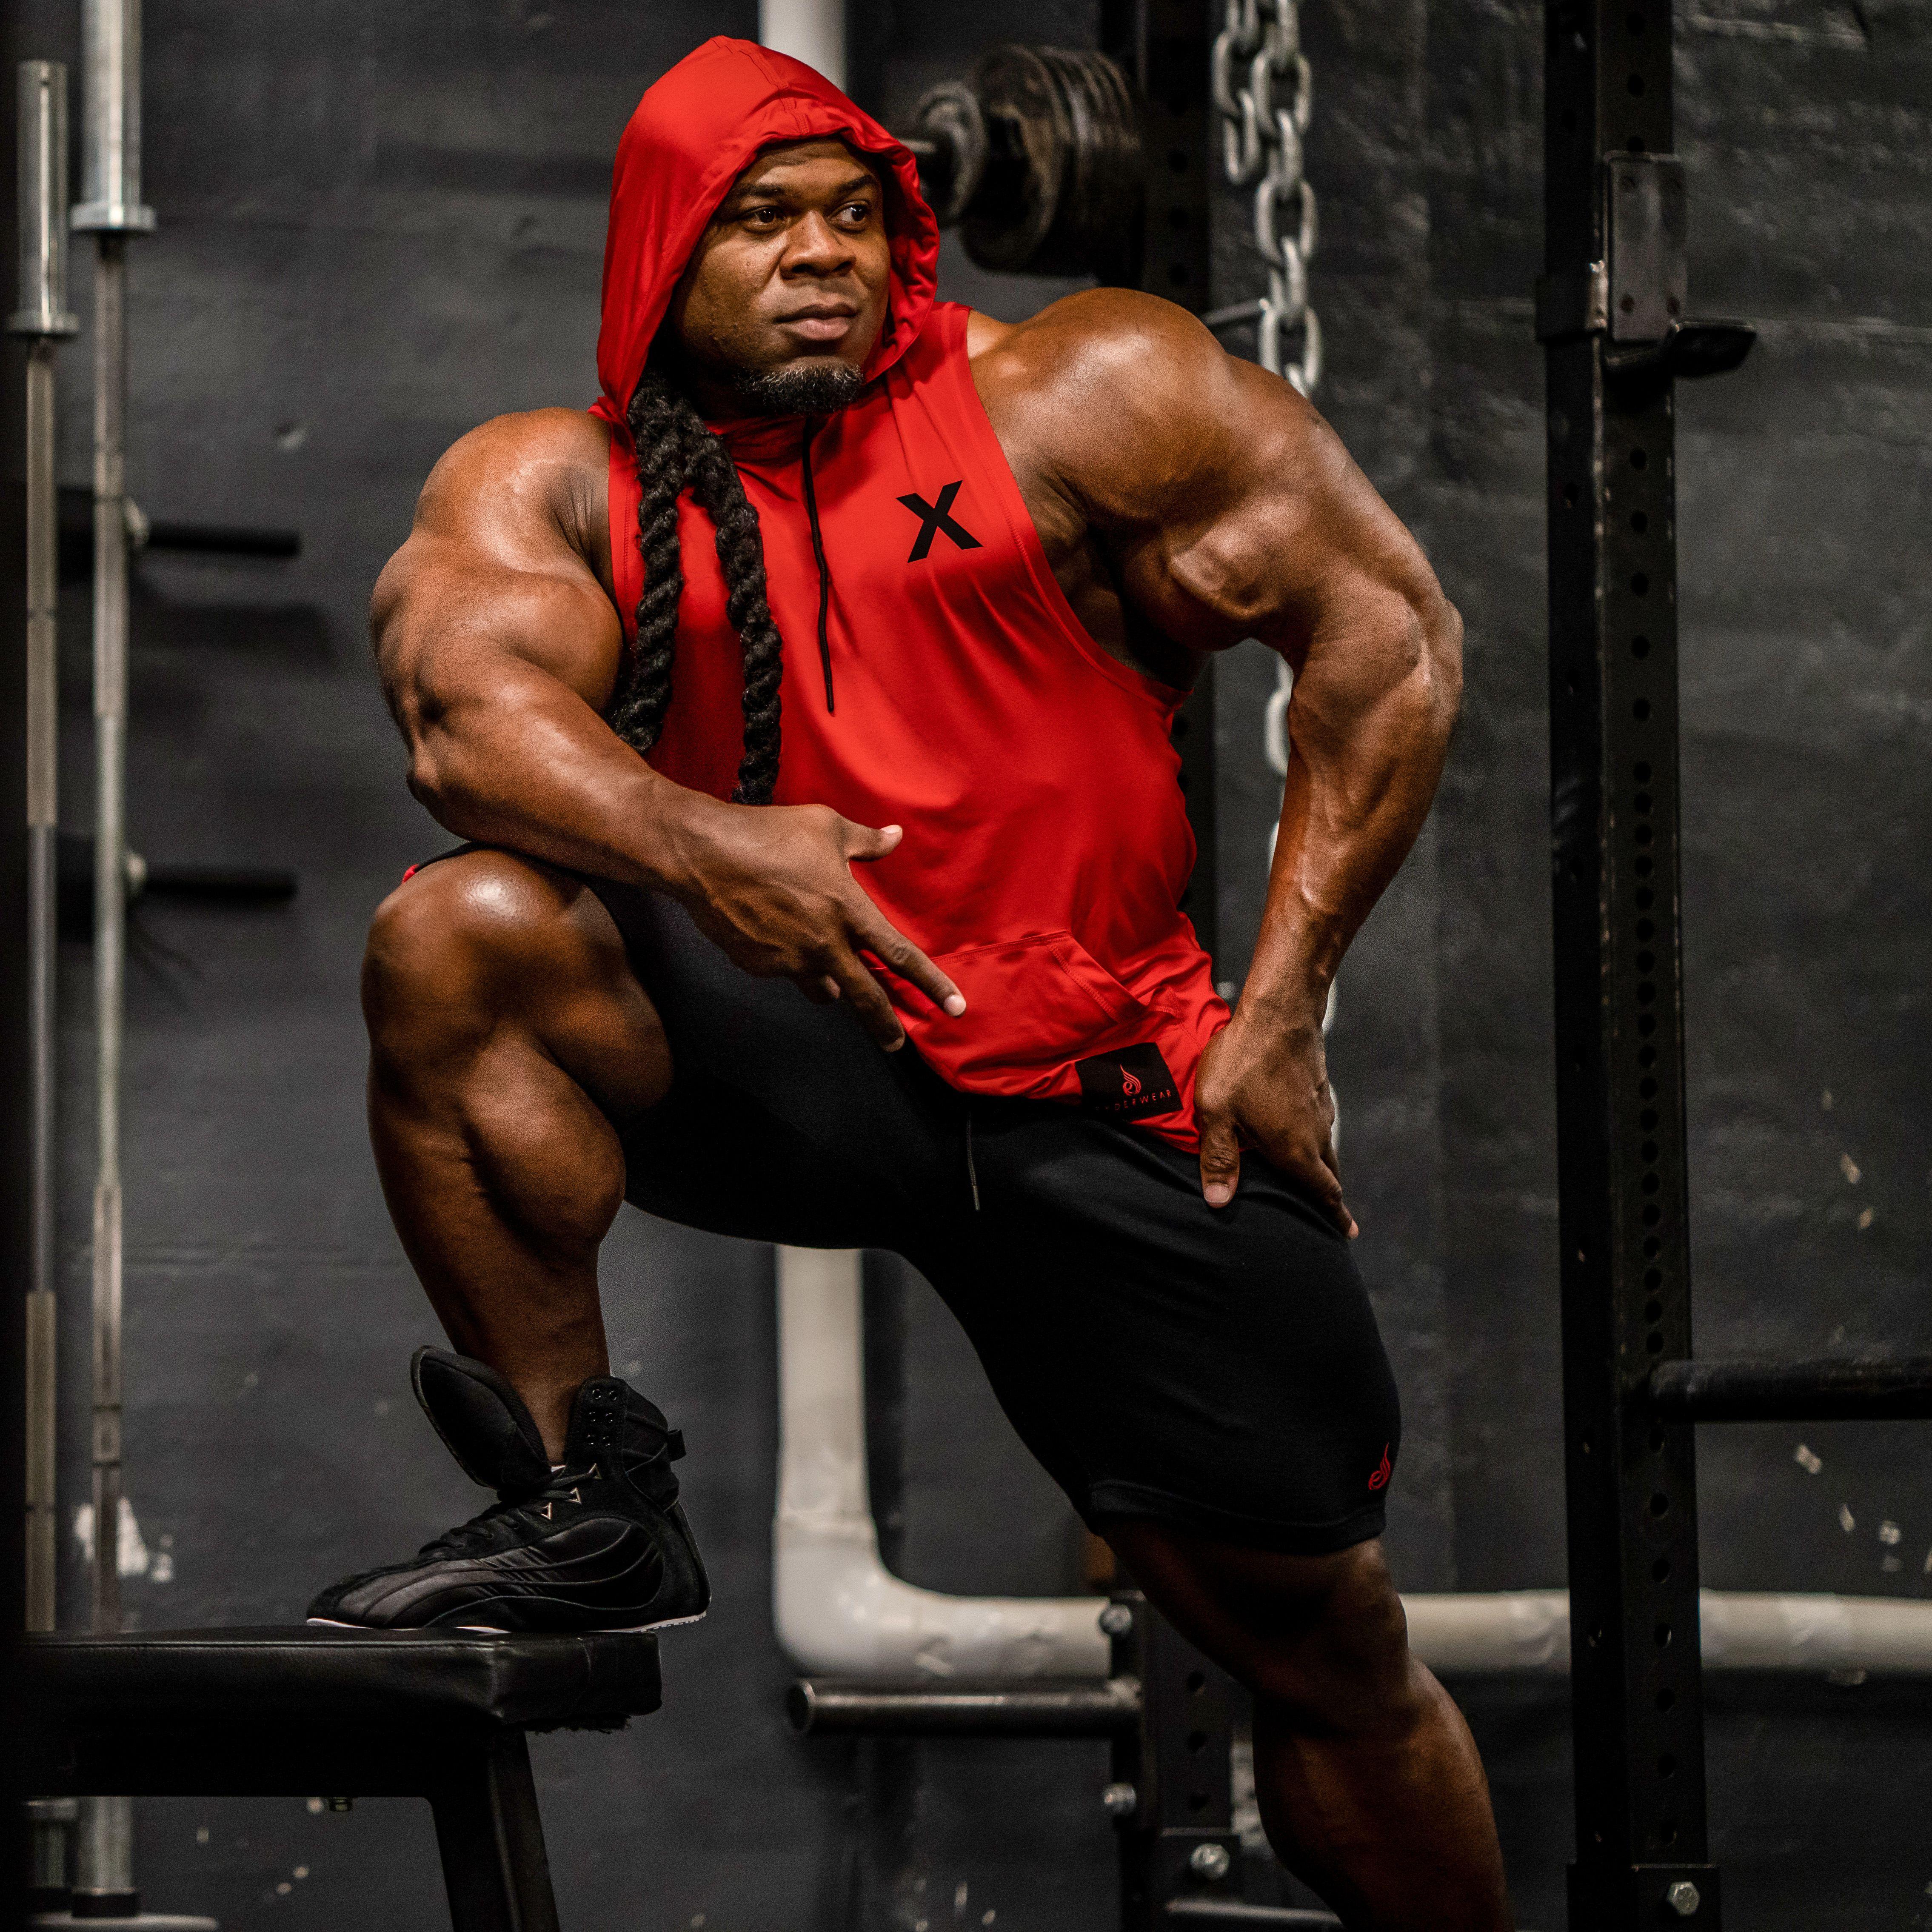 ARNOLD SCHWARZENEGGER POSTER Conquer Pumping Iron Bodybuilding Gym Weights A3 A4